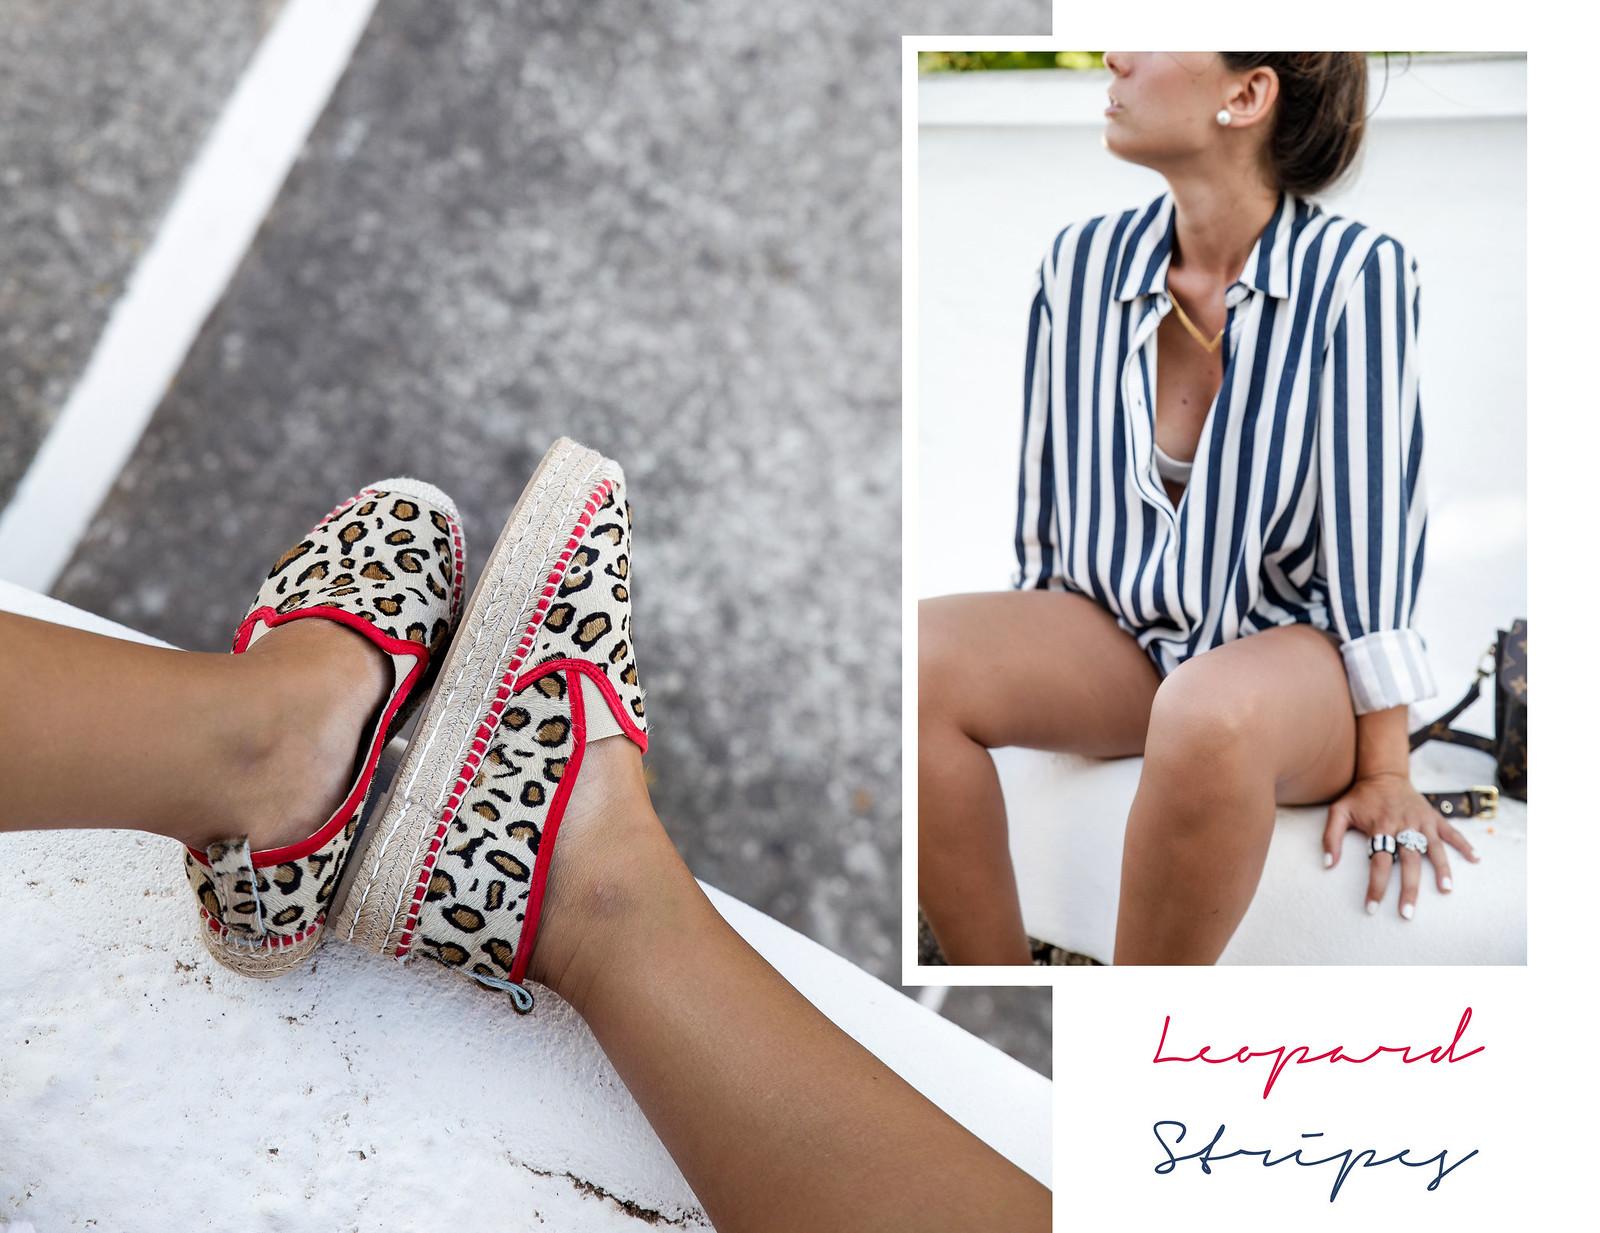 07_Leopard_and_stripes_perfec_mix_print_outfit_THEGUESTGIRL_palmaira_sandals_leopard_inspo